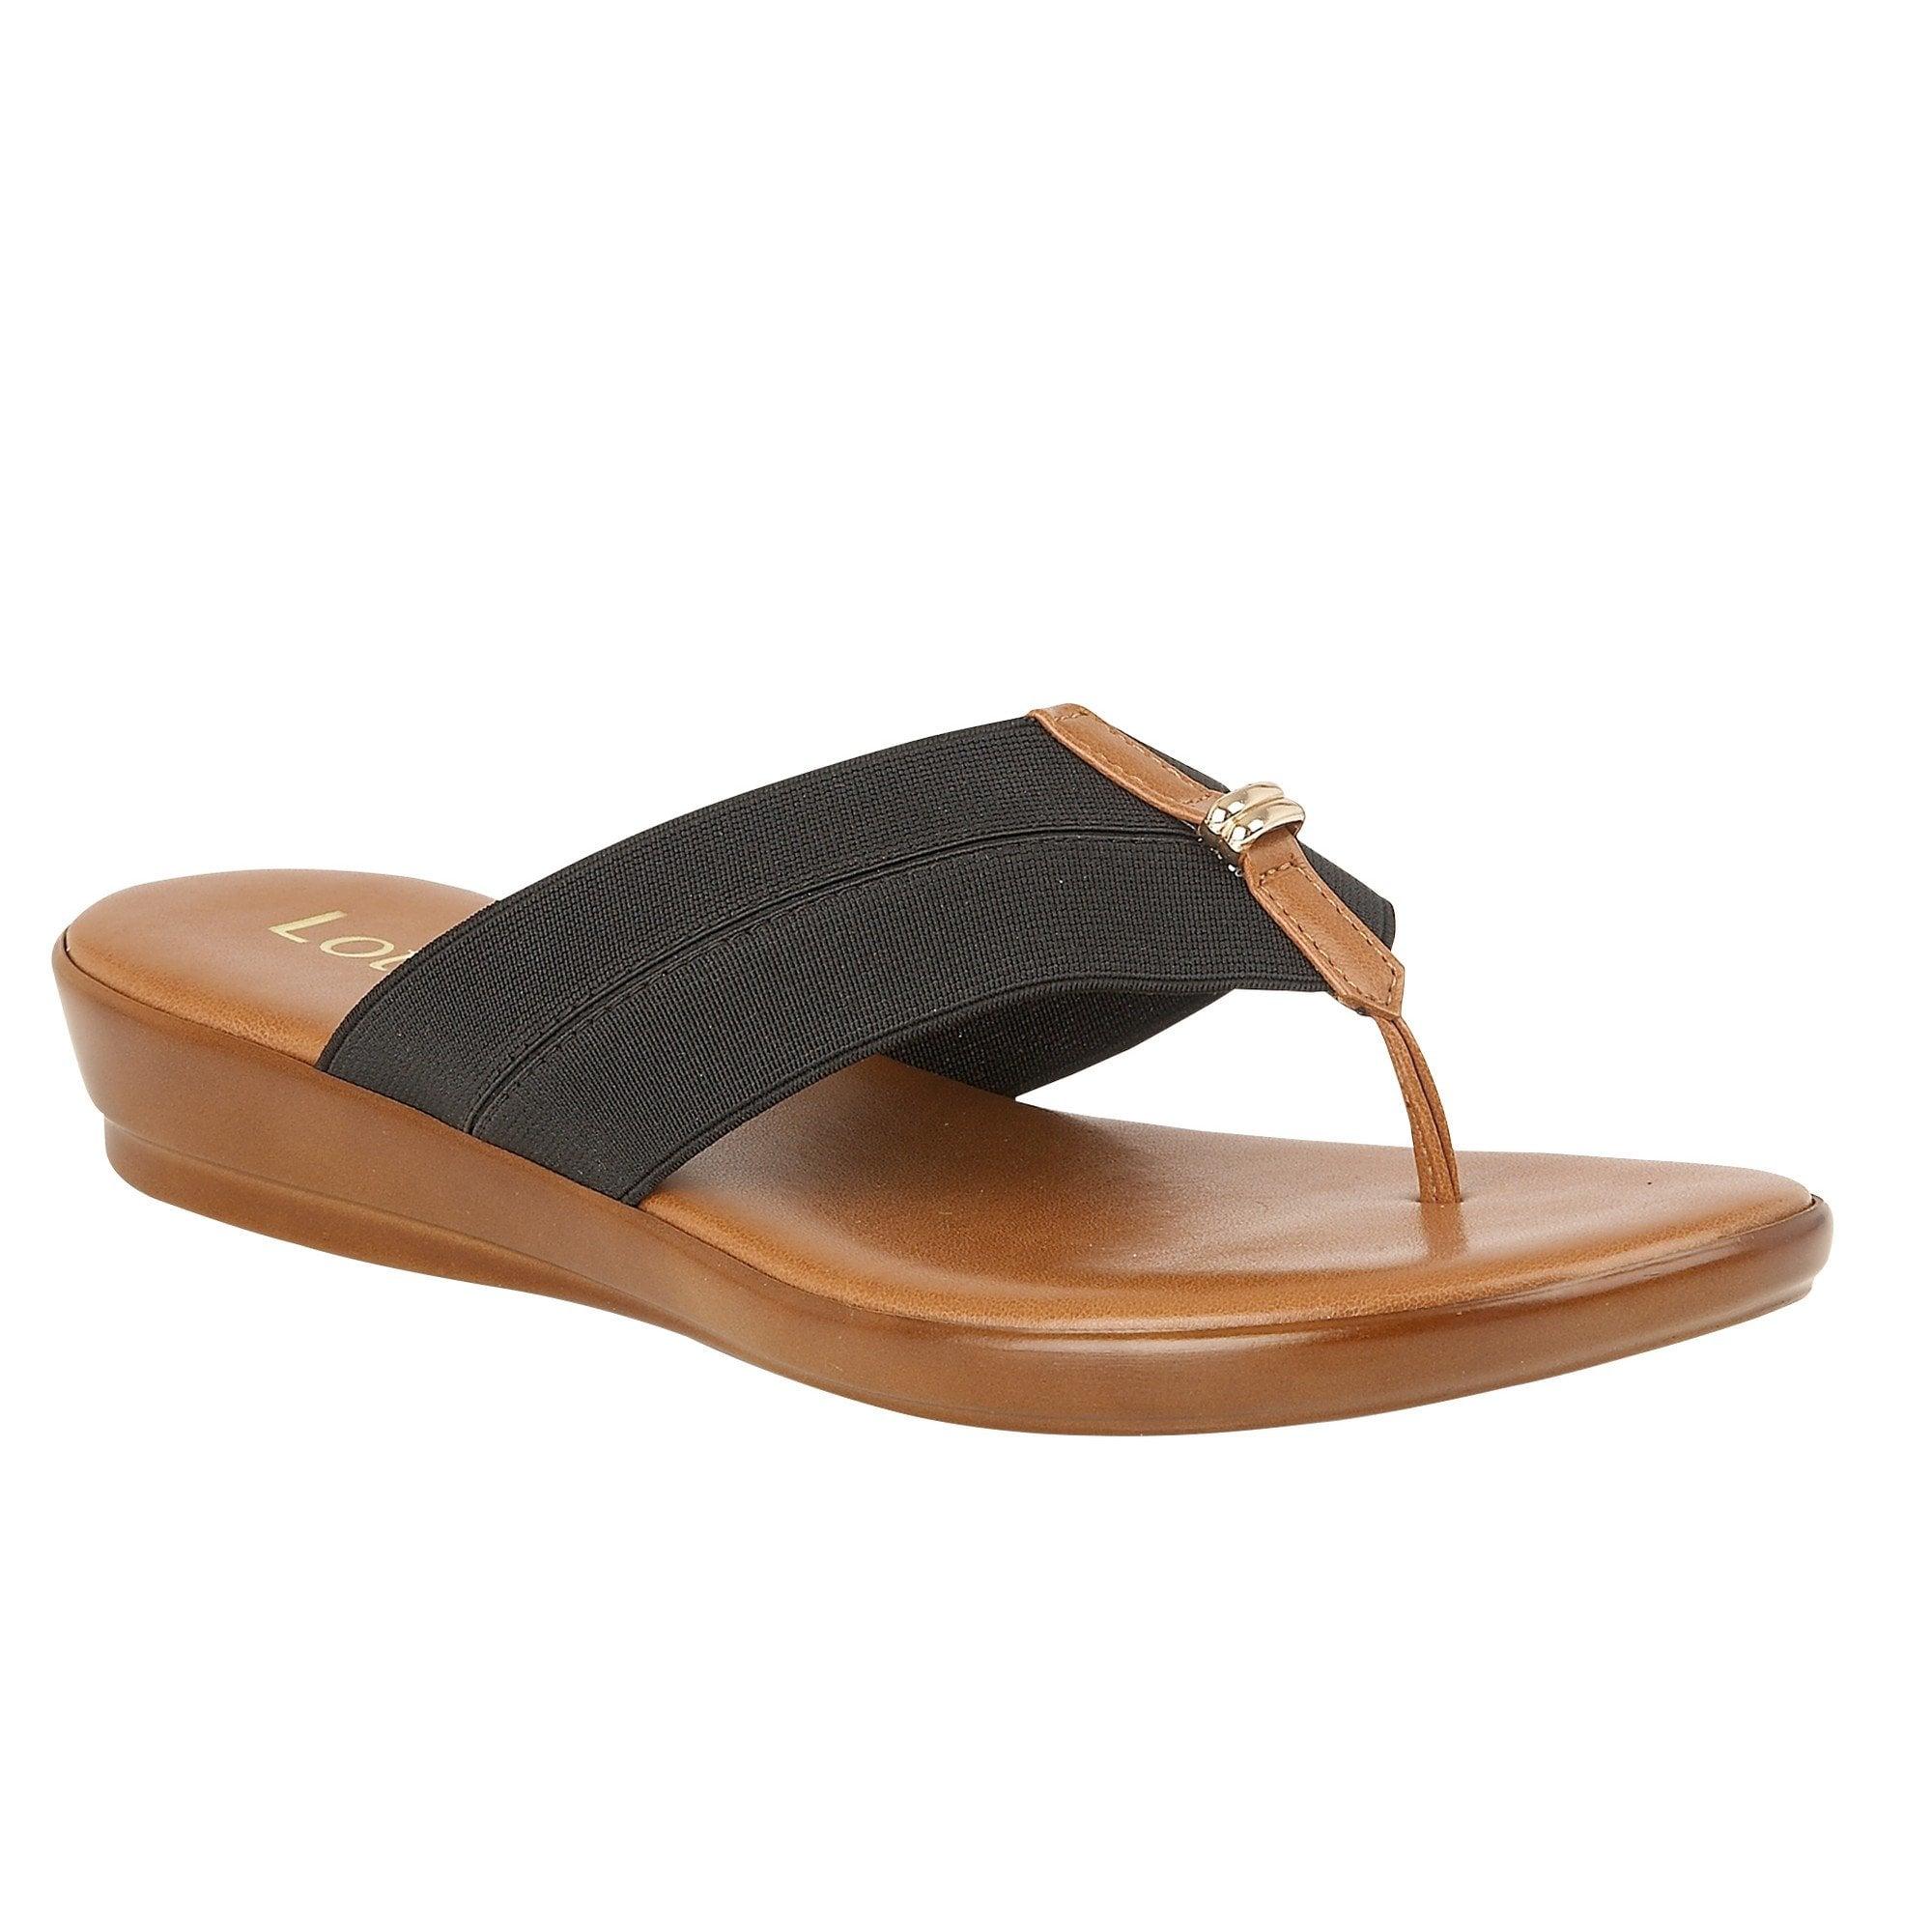 Buy the black Lotus ladies' Hera sandal